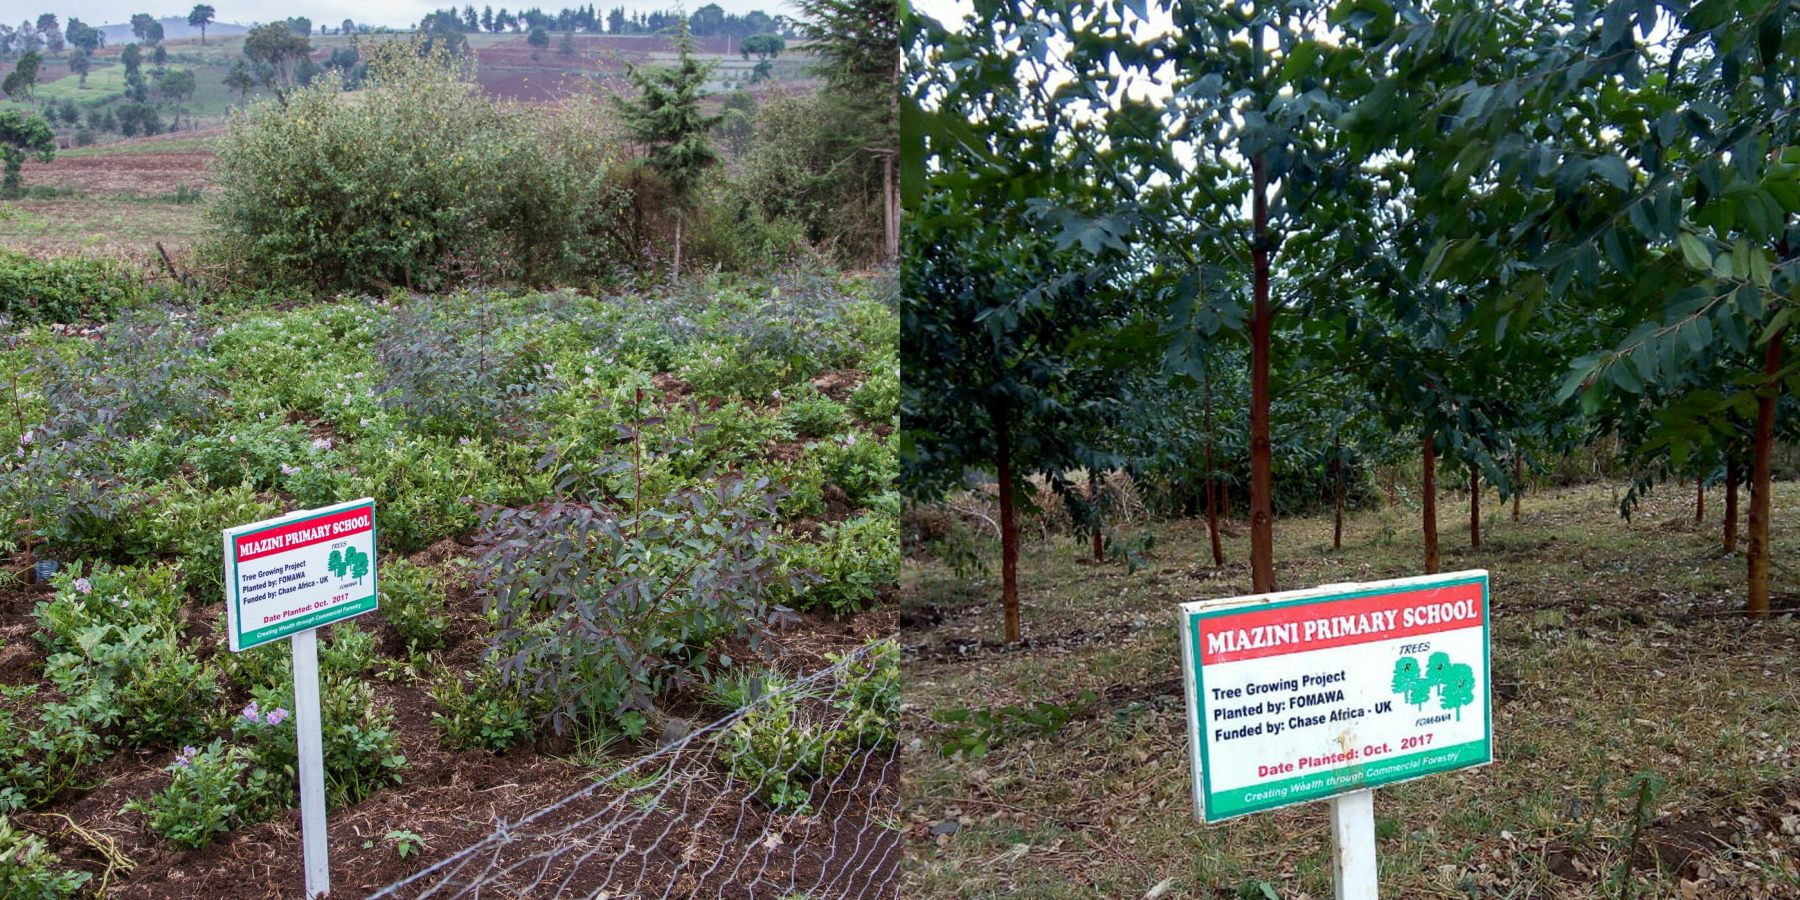 Miazini School - a year of tree growth comparison